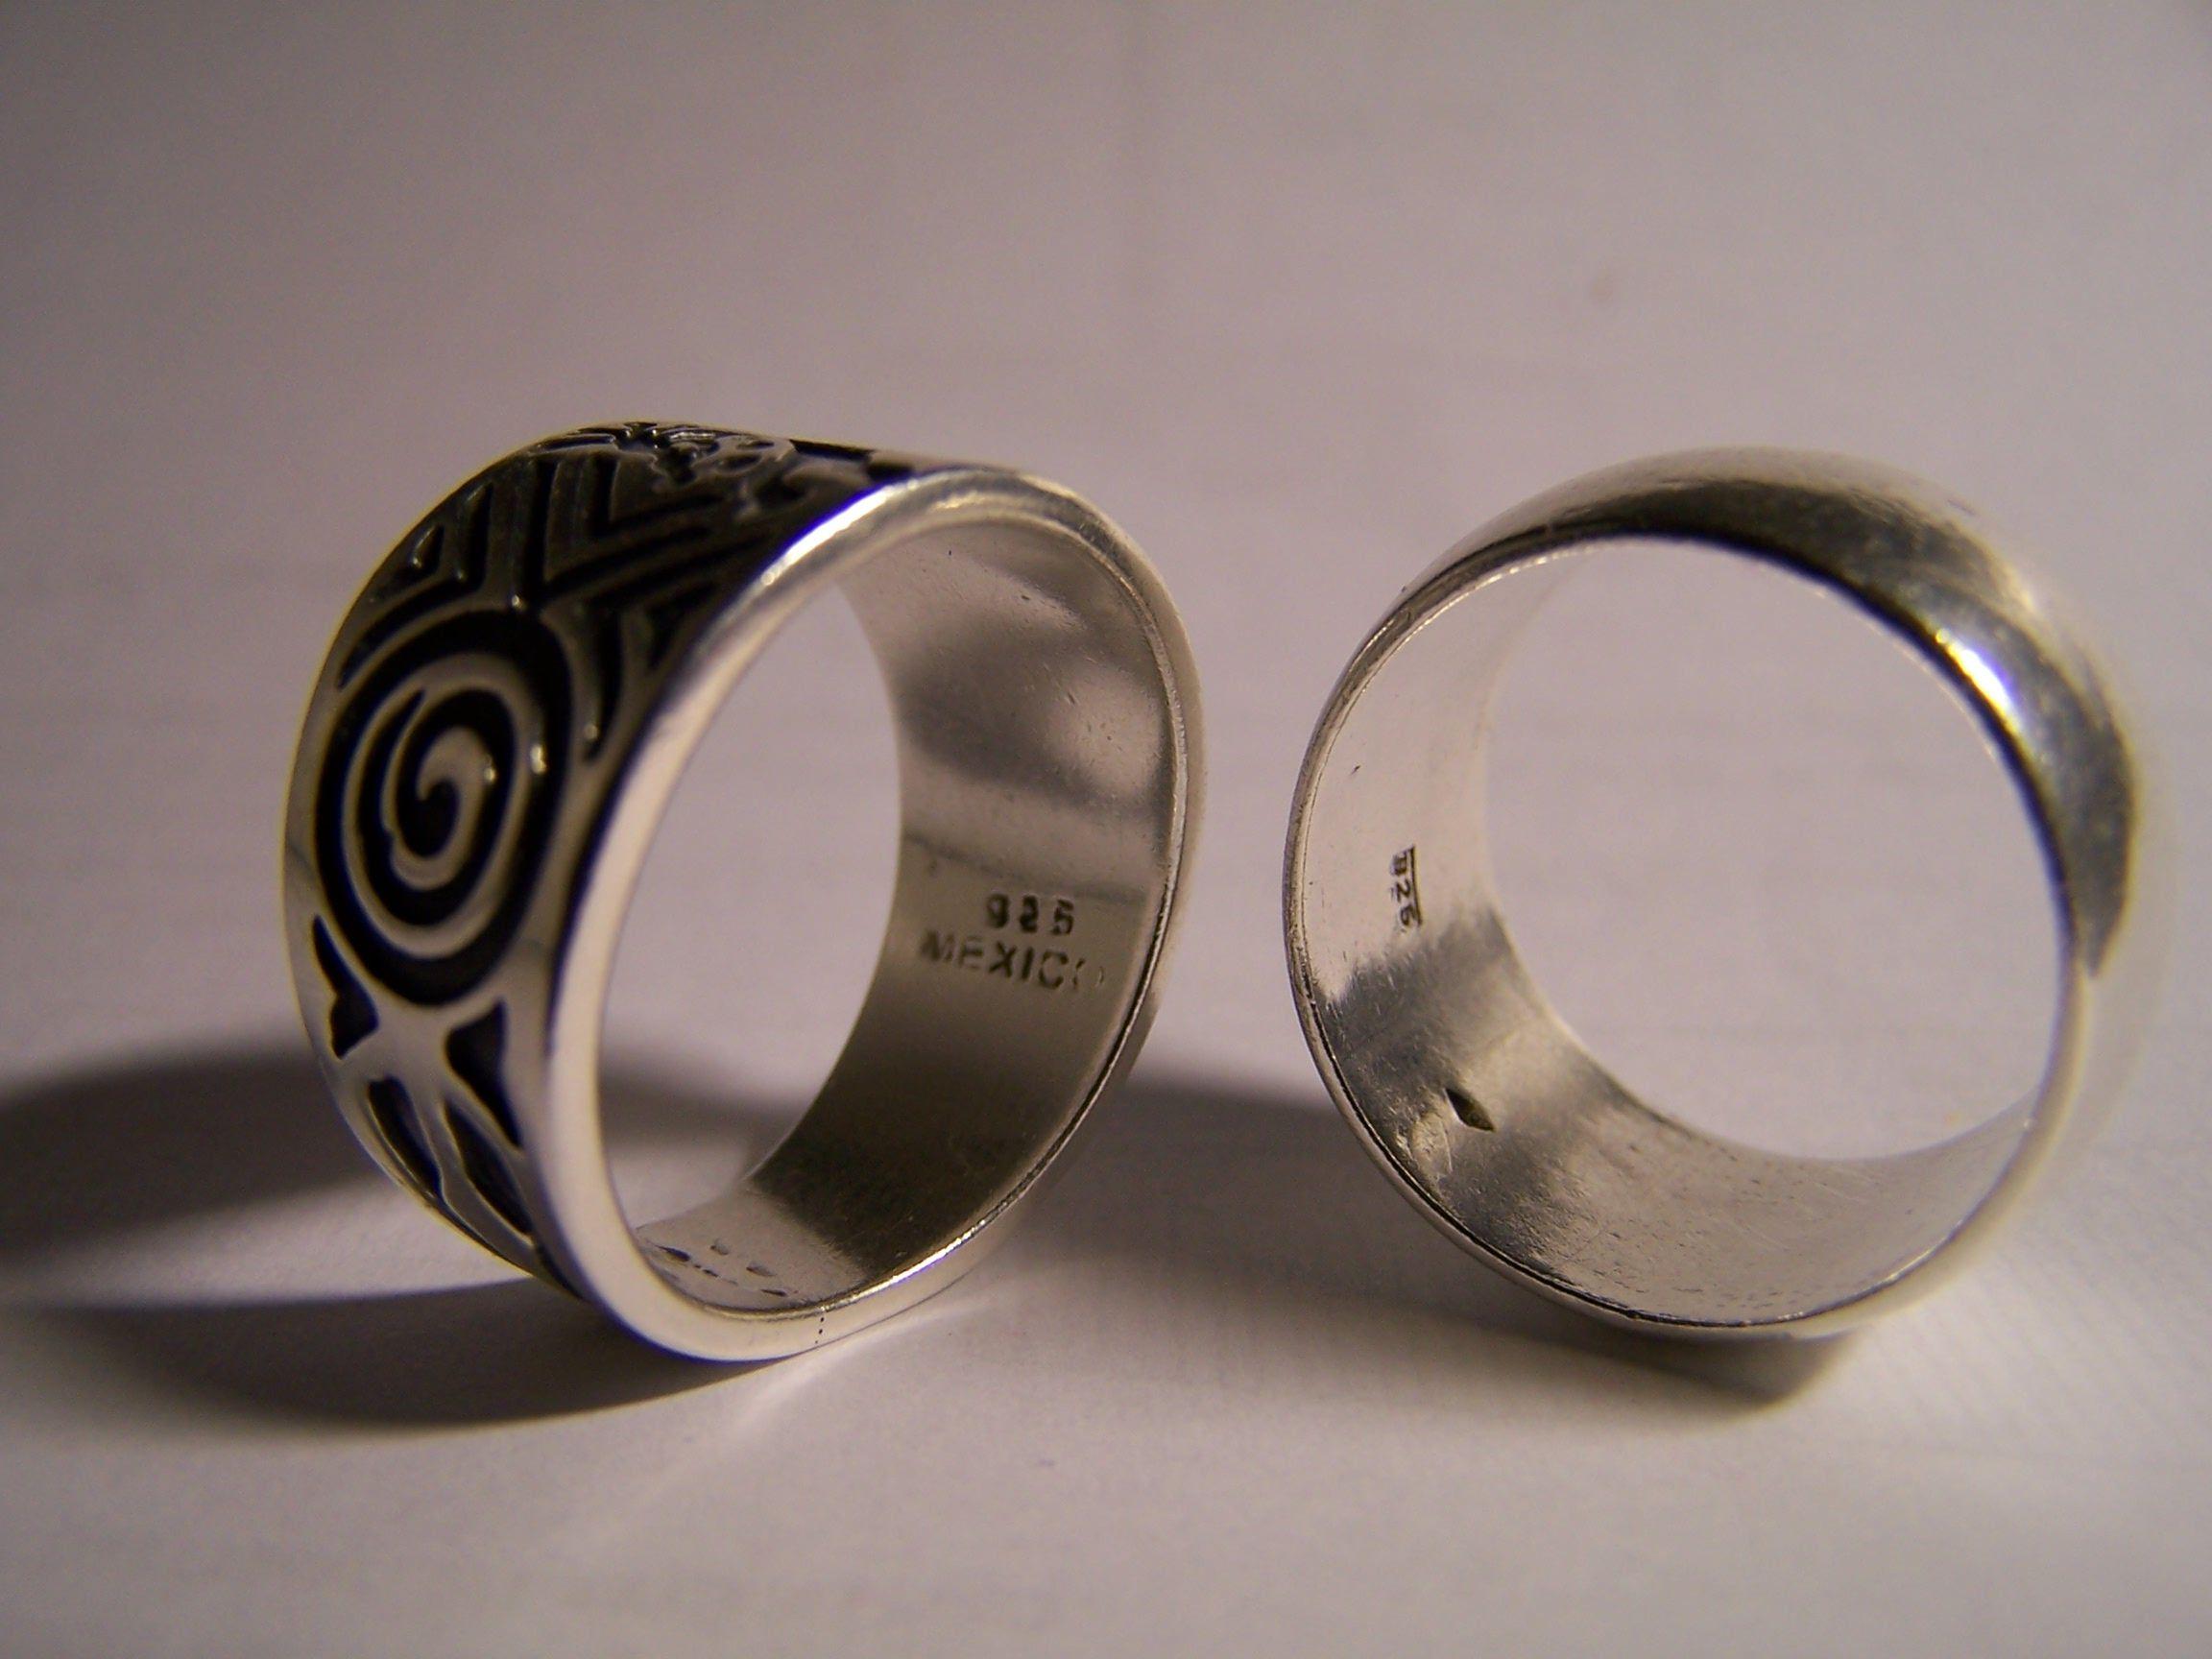 8b7835b47265 File Marca plata de ley 925 en dos anillos.JPG - Wikimedia Commons